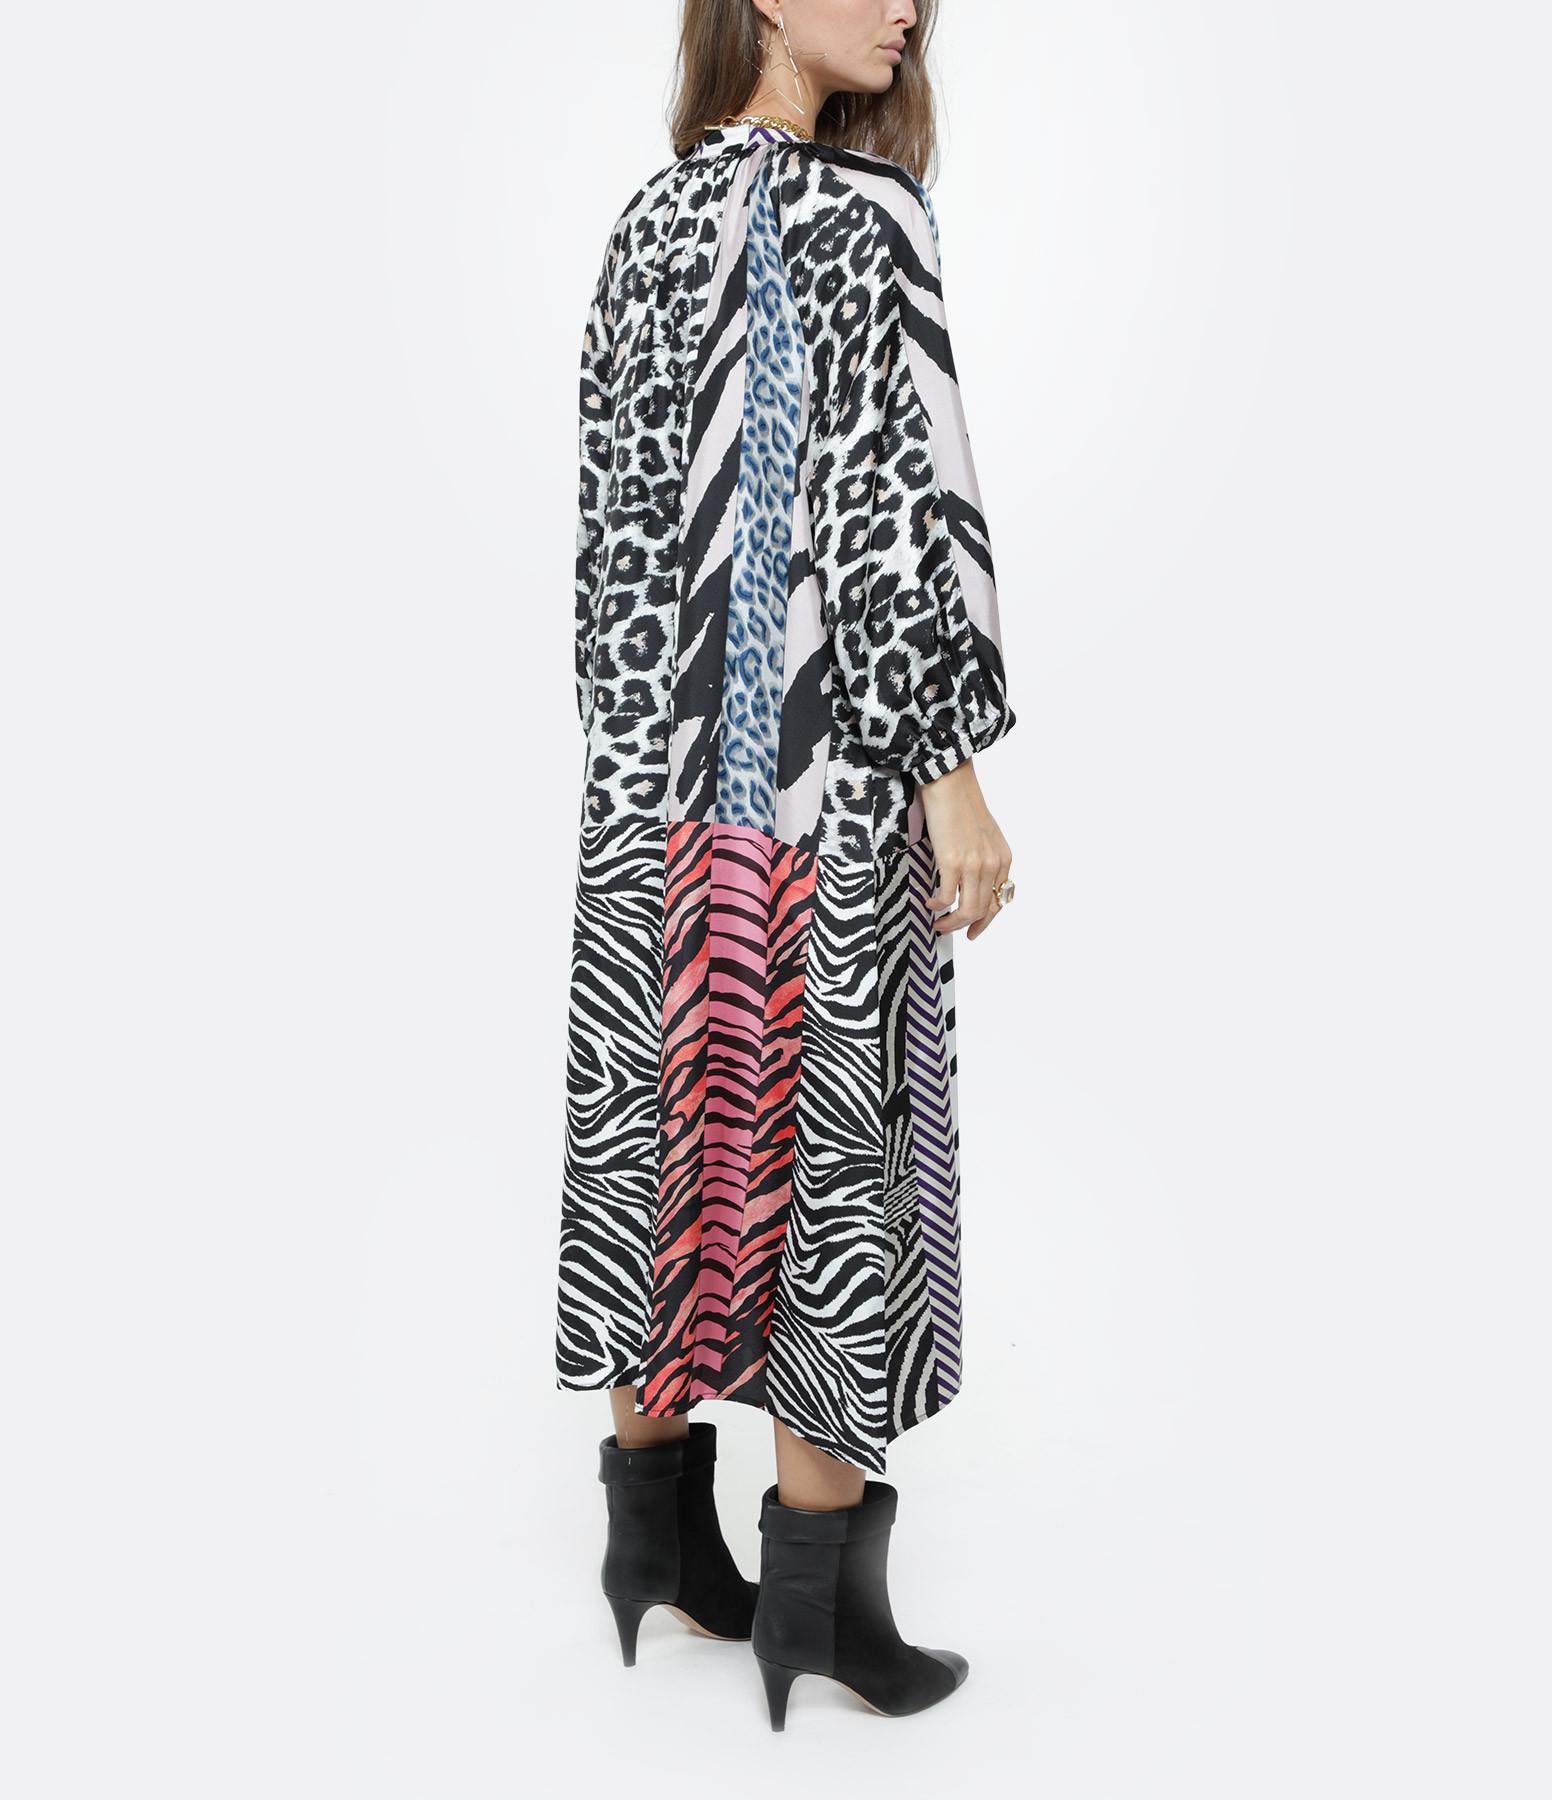 PIERRE-LOUIS MASCIA - Robe Aloe Soie Imprimé Animal Multicolore